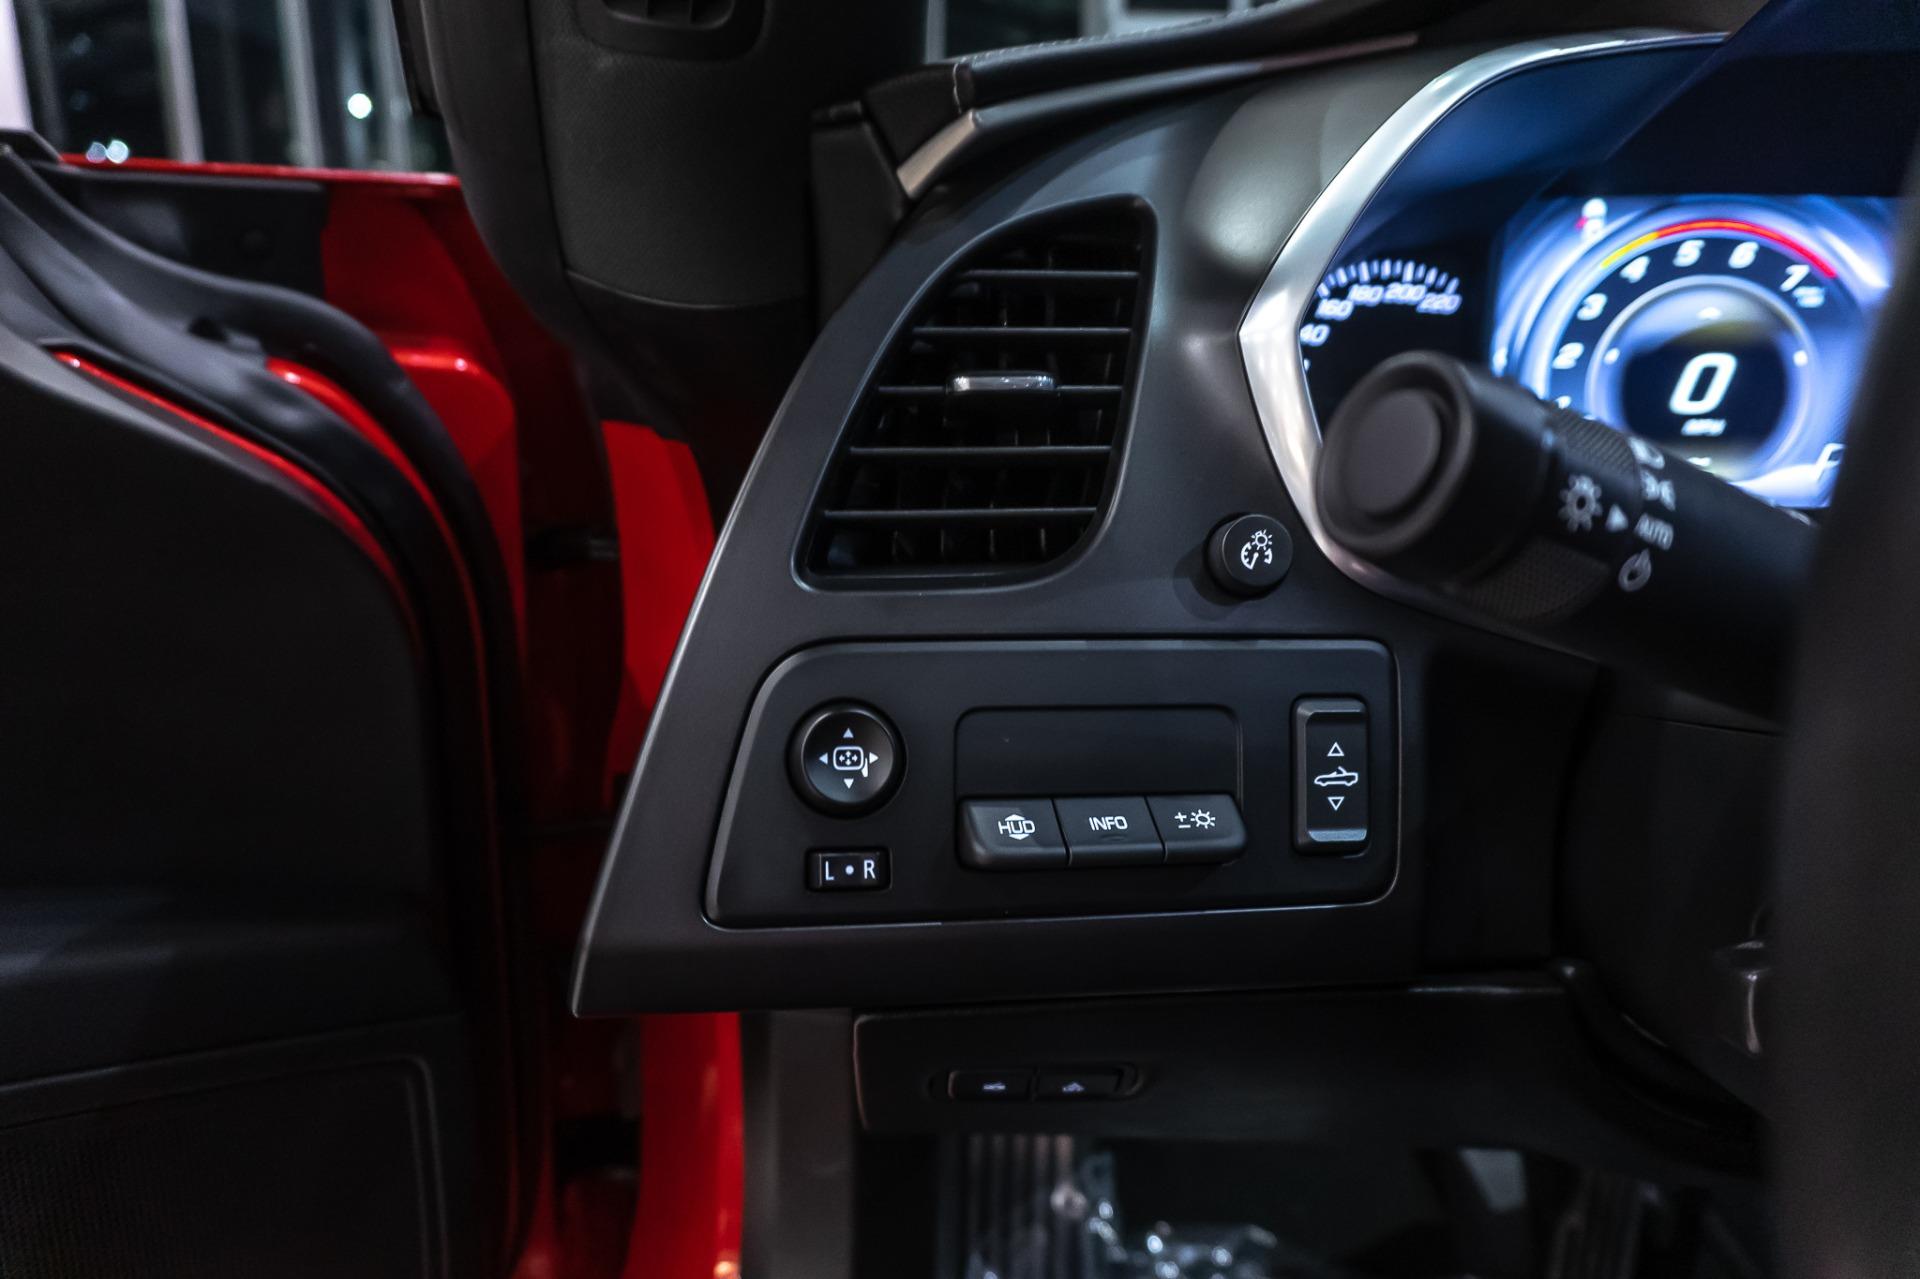 Used-2016-Chevrolet-Corvette-Z06-2LZ-Convertible-MSRP-96970